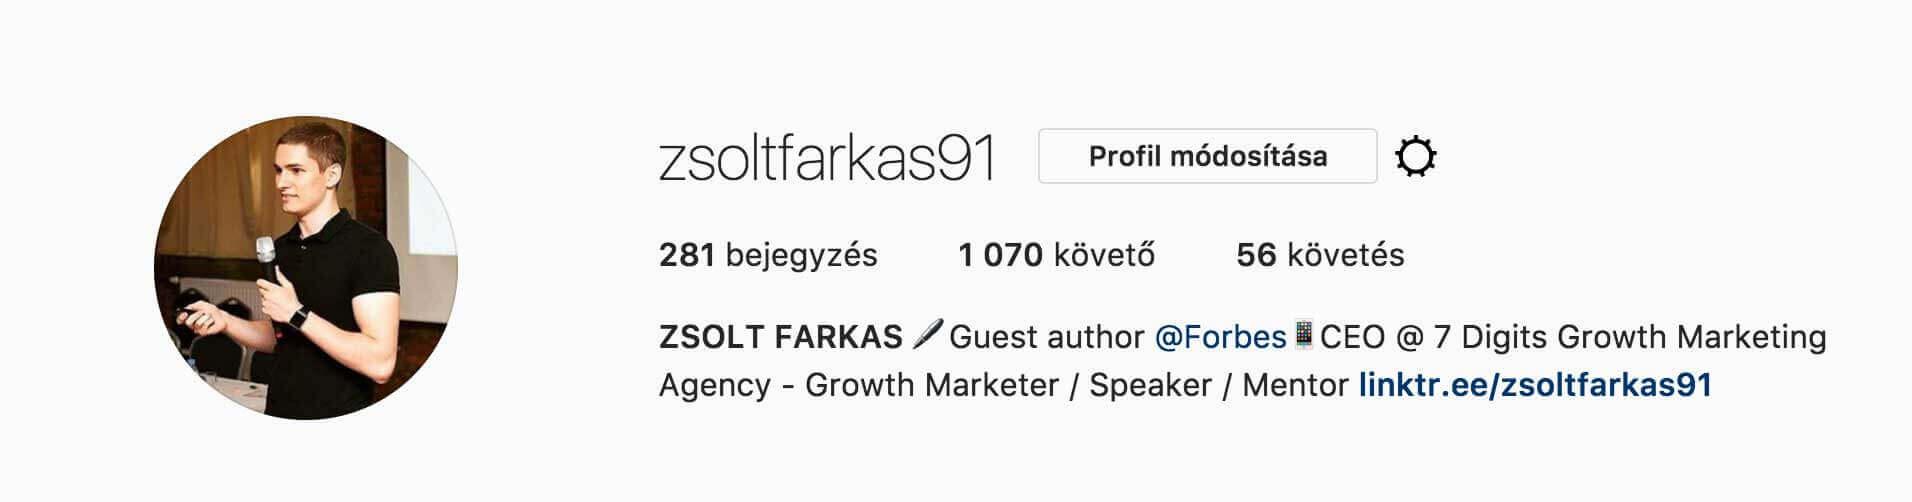 farkas zsolt instagram profil